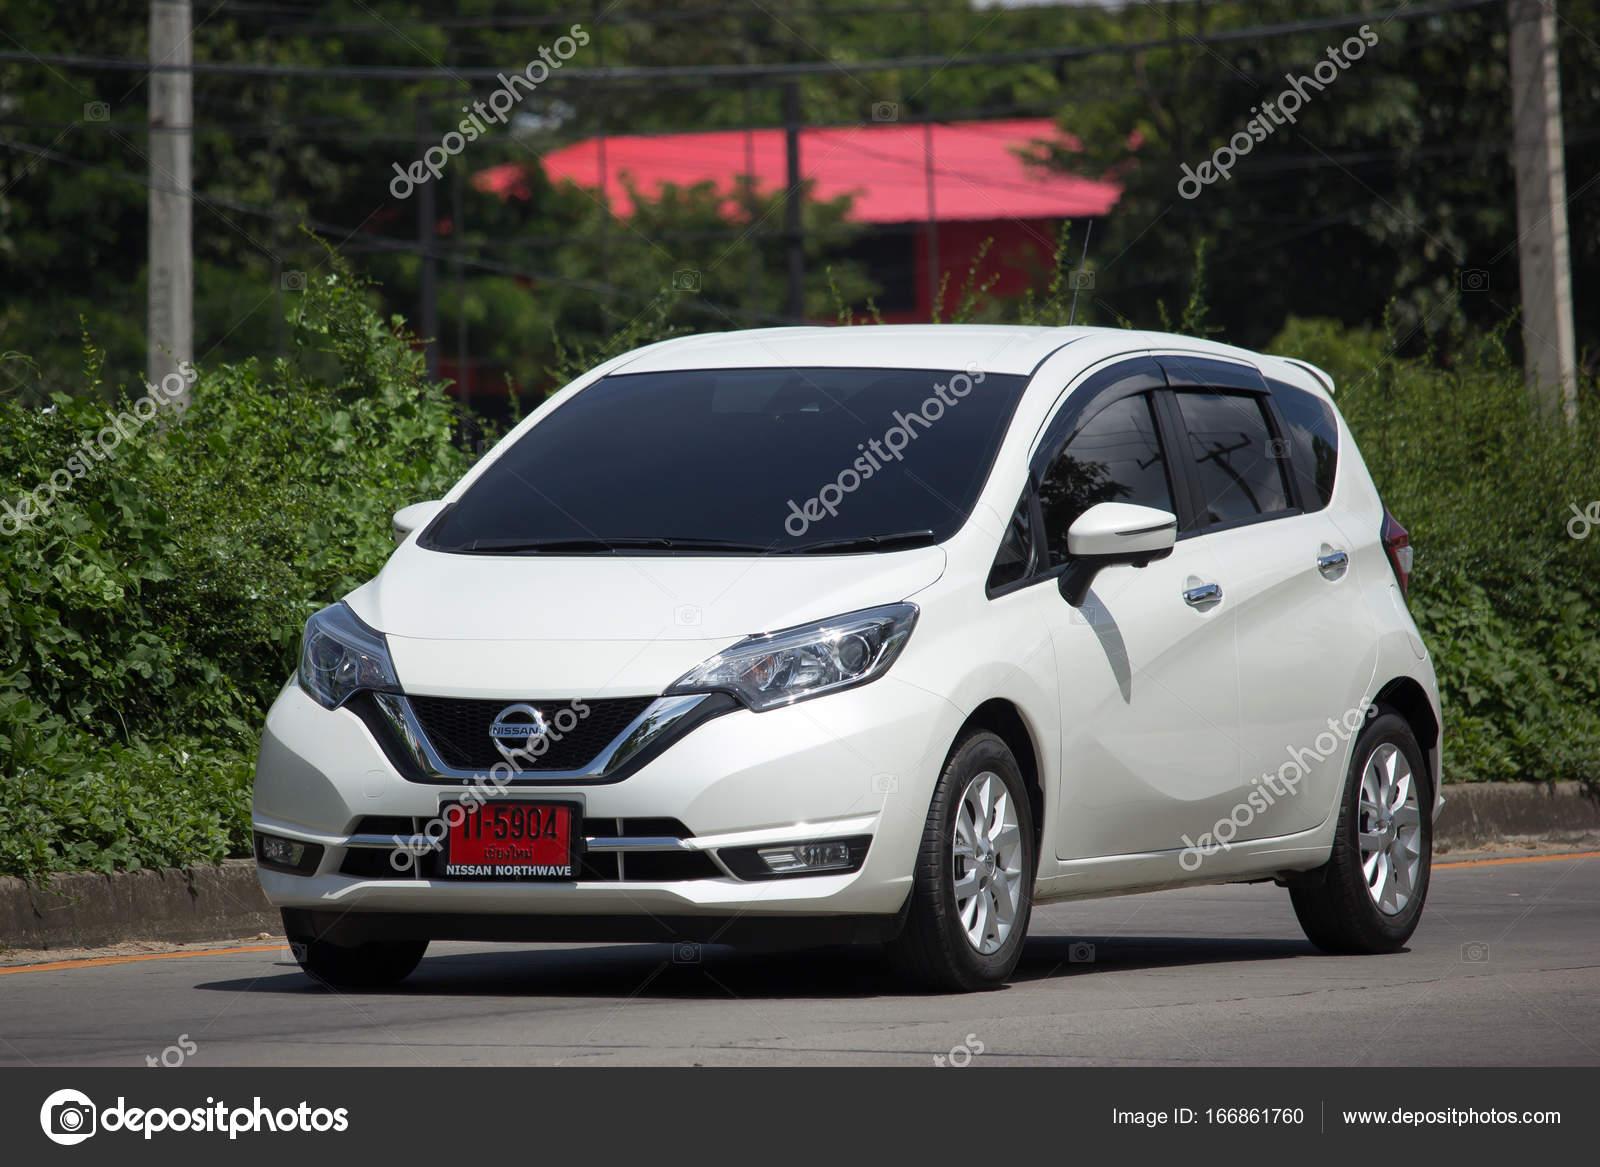 neues Öko-auto nissan note — redaktionelles stockfoto © nitinut380